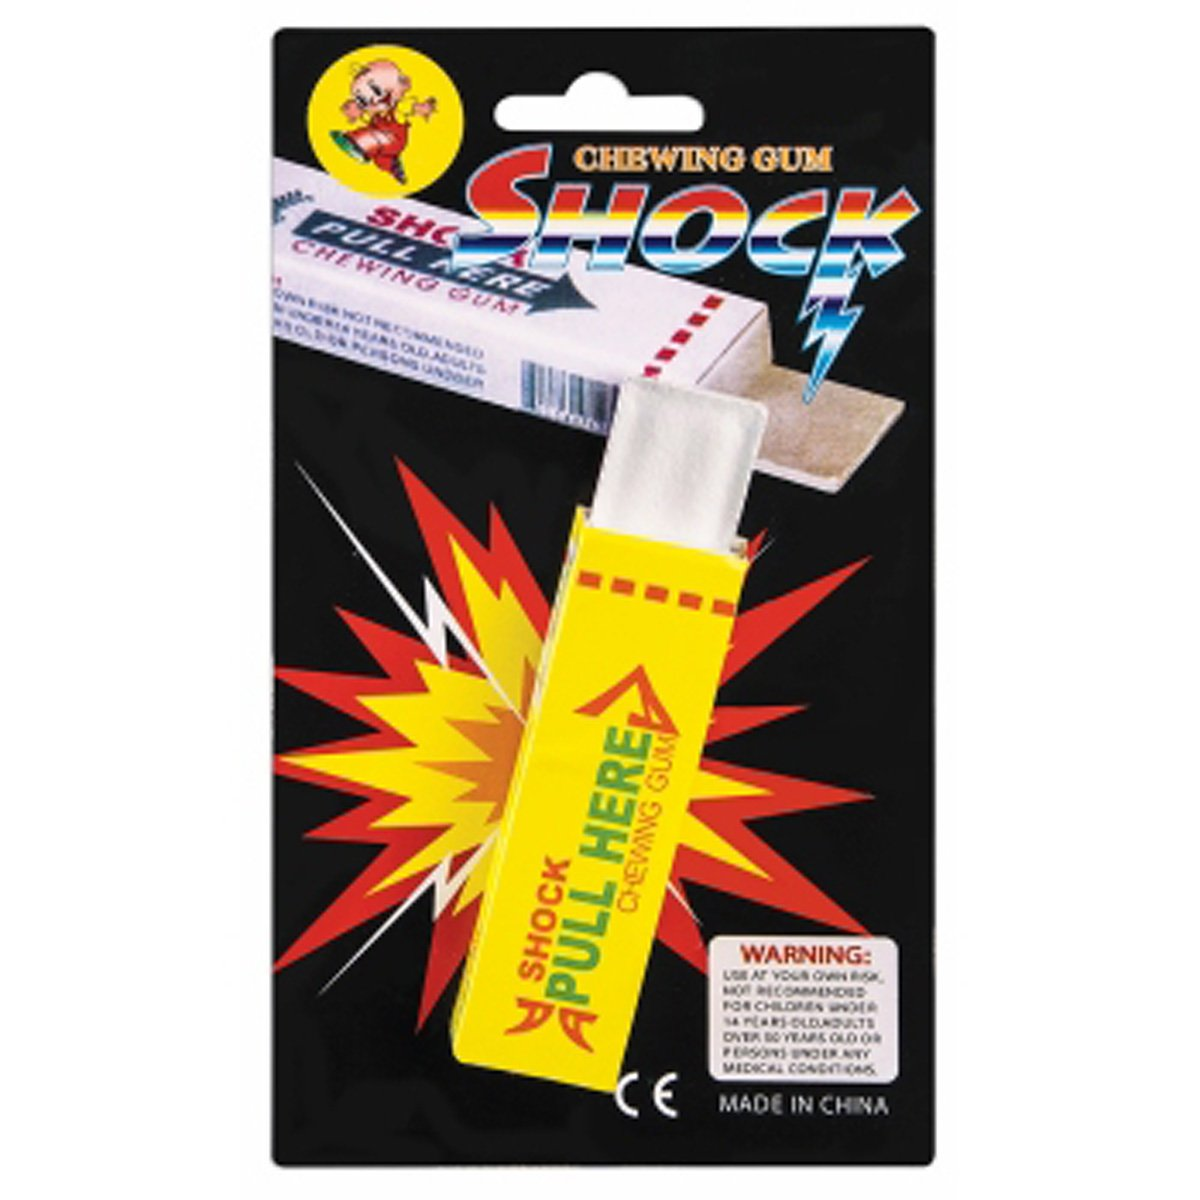 Shock Chewing Gum, Electrical Shocking Gum ToyCenter 12582